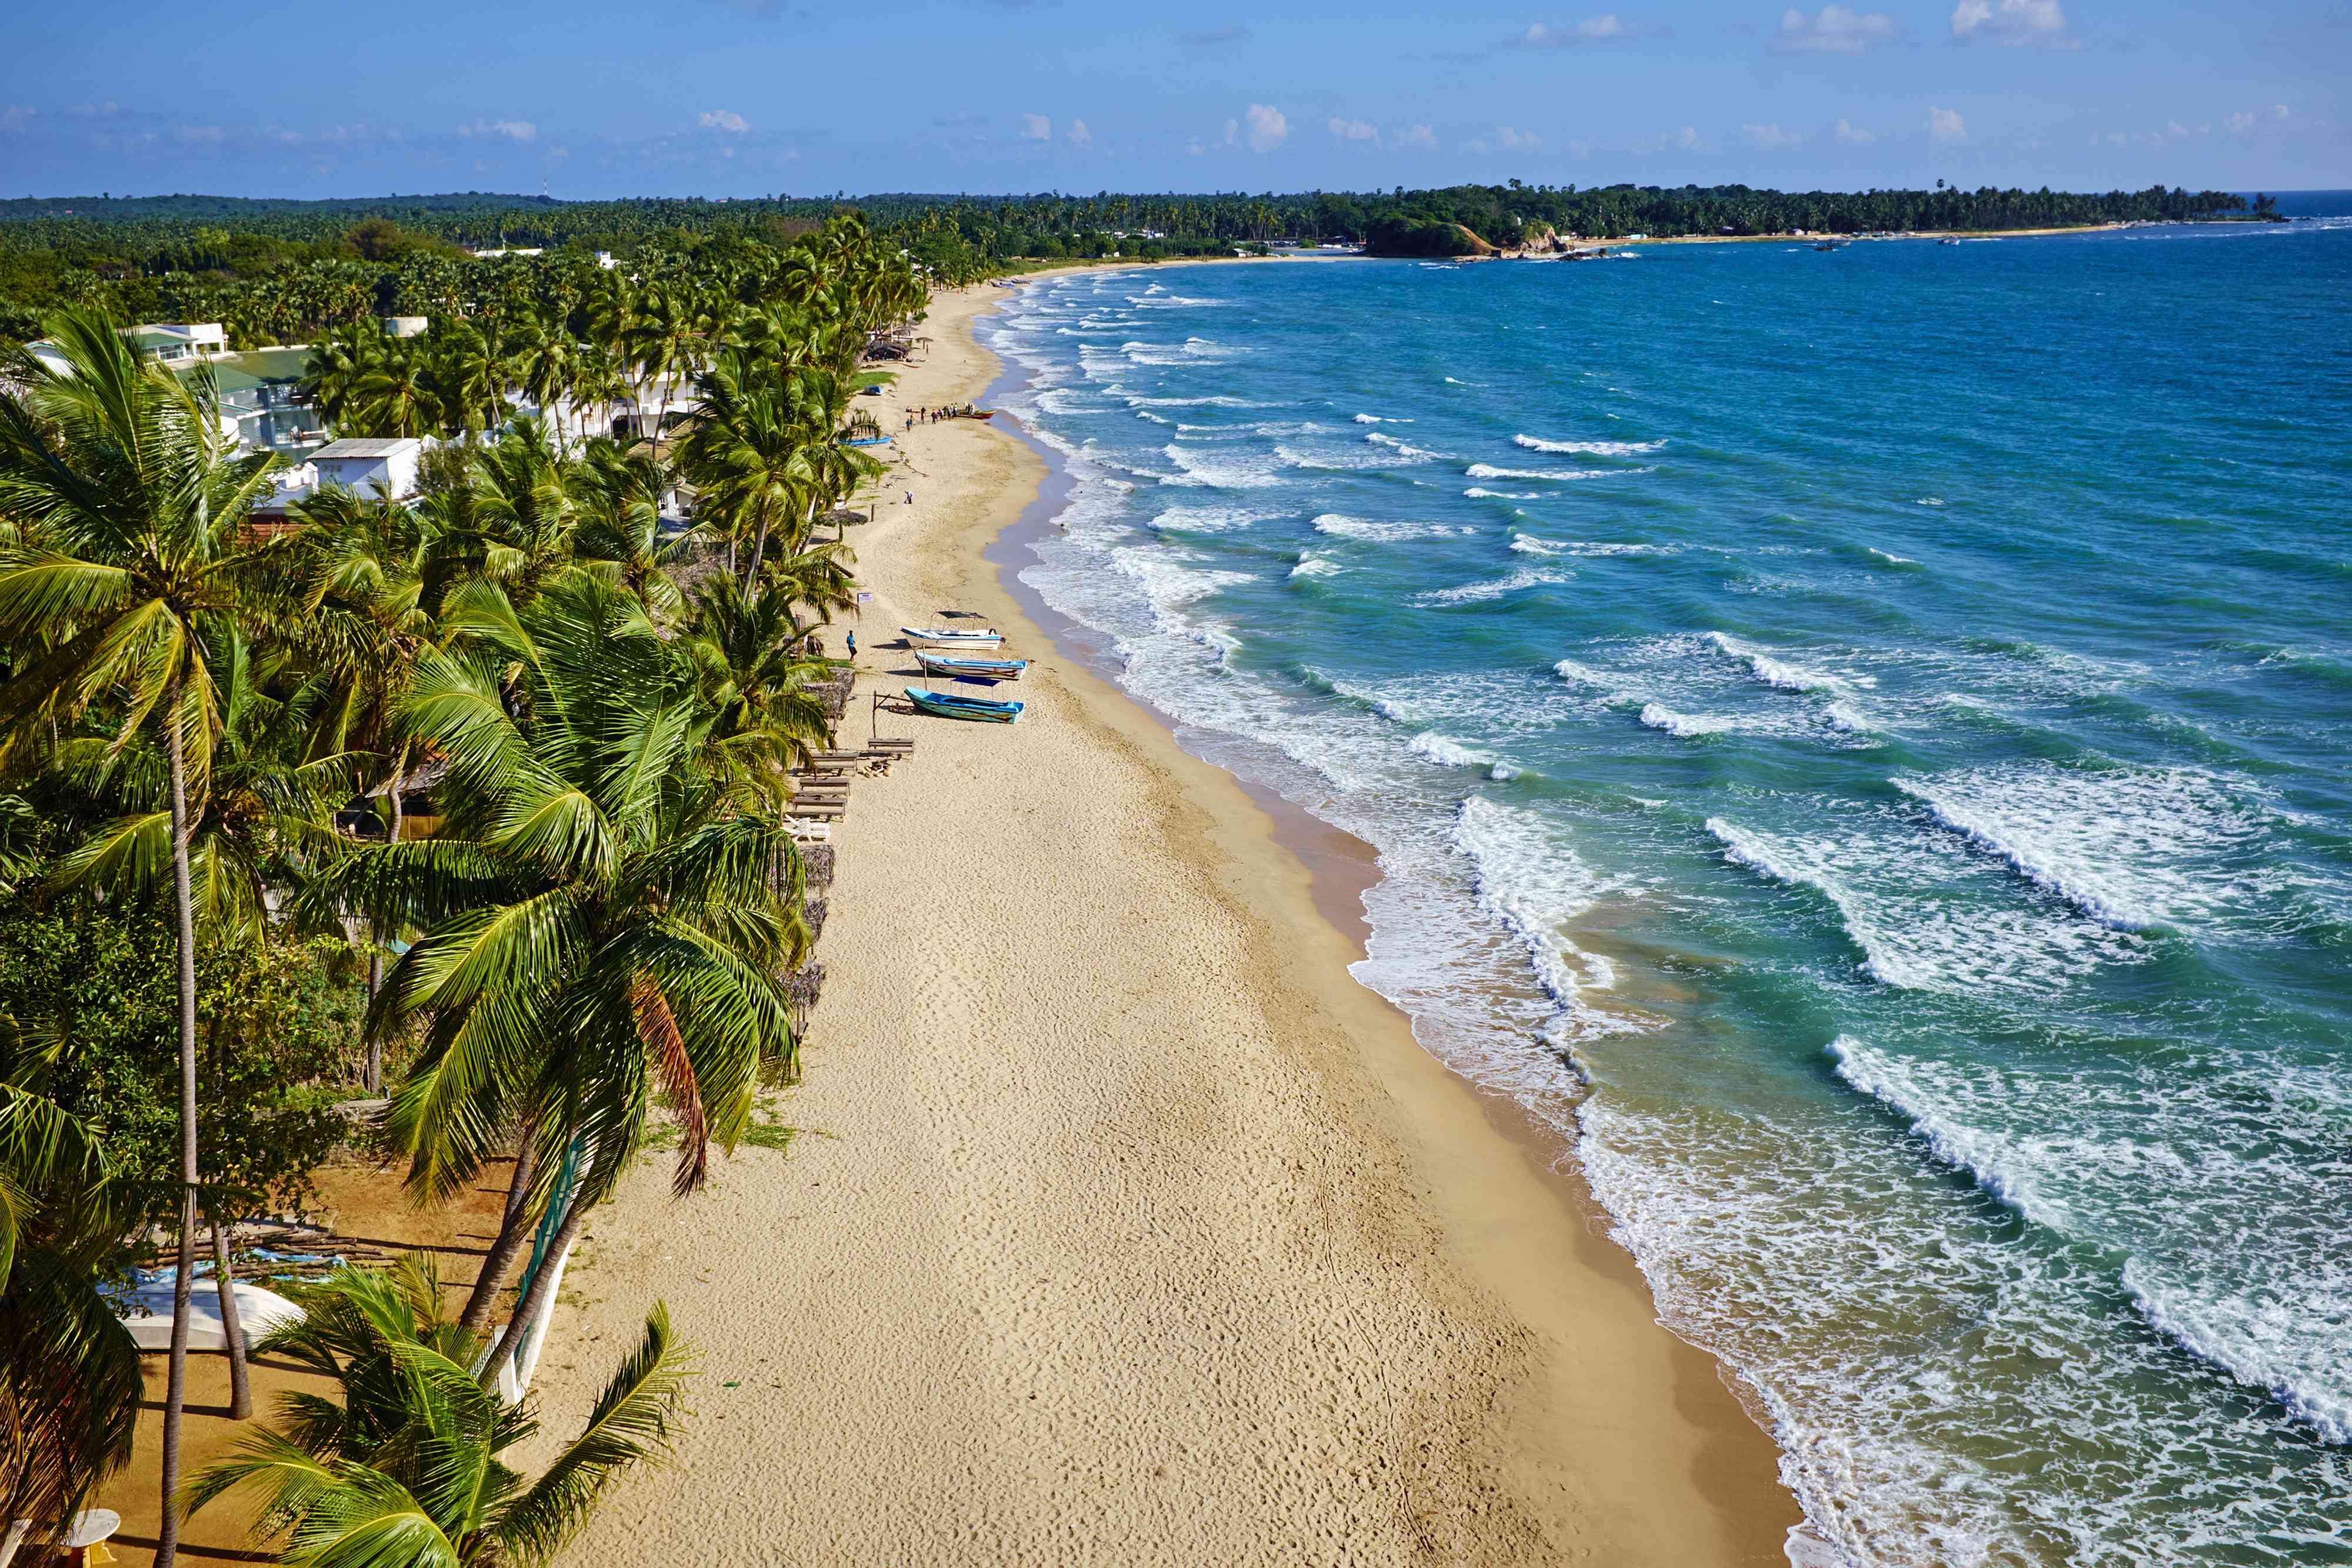 Aerial view of Uppuveli Beach at Trincaomalee, Sri Lanka